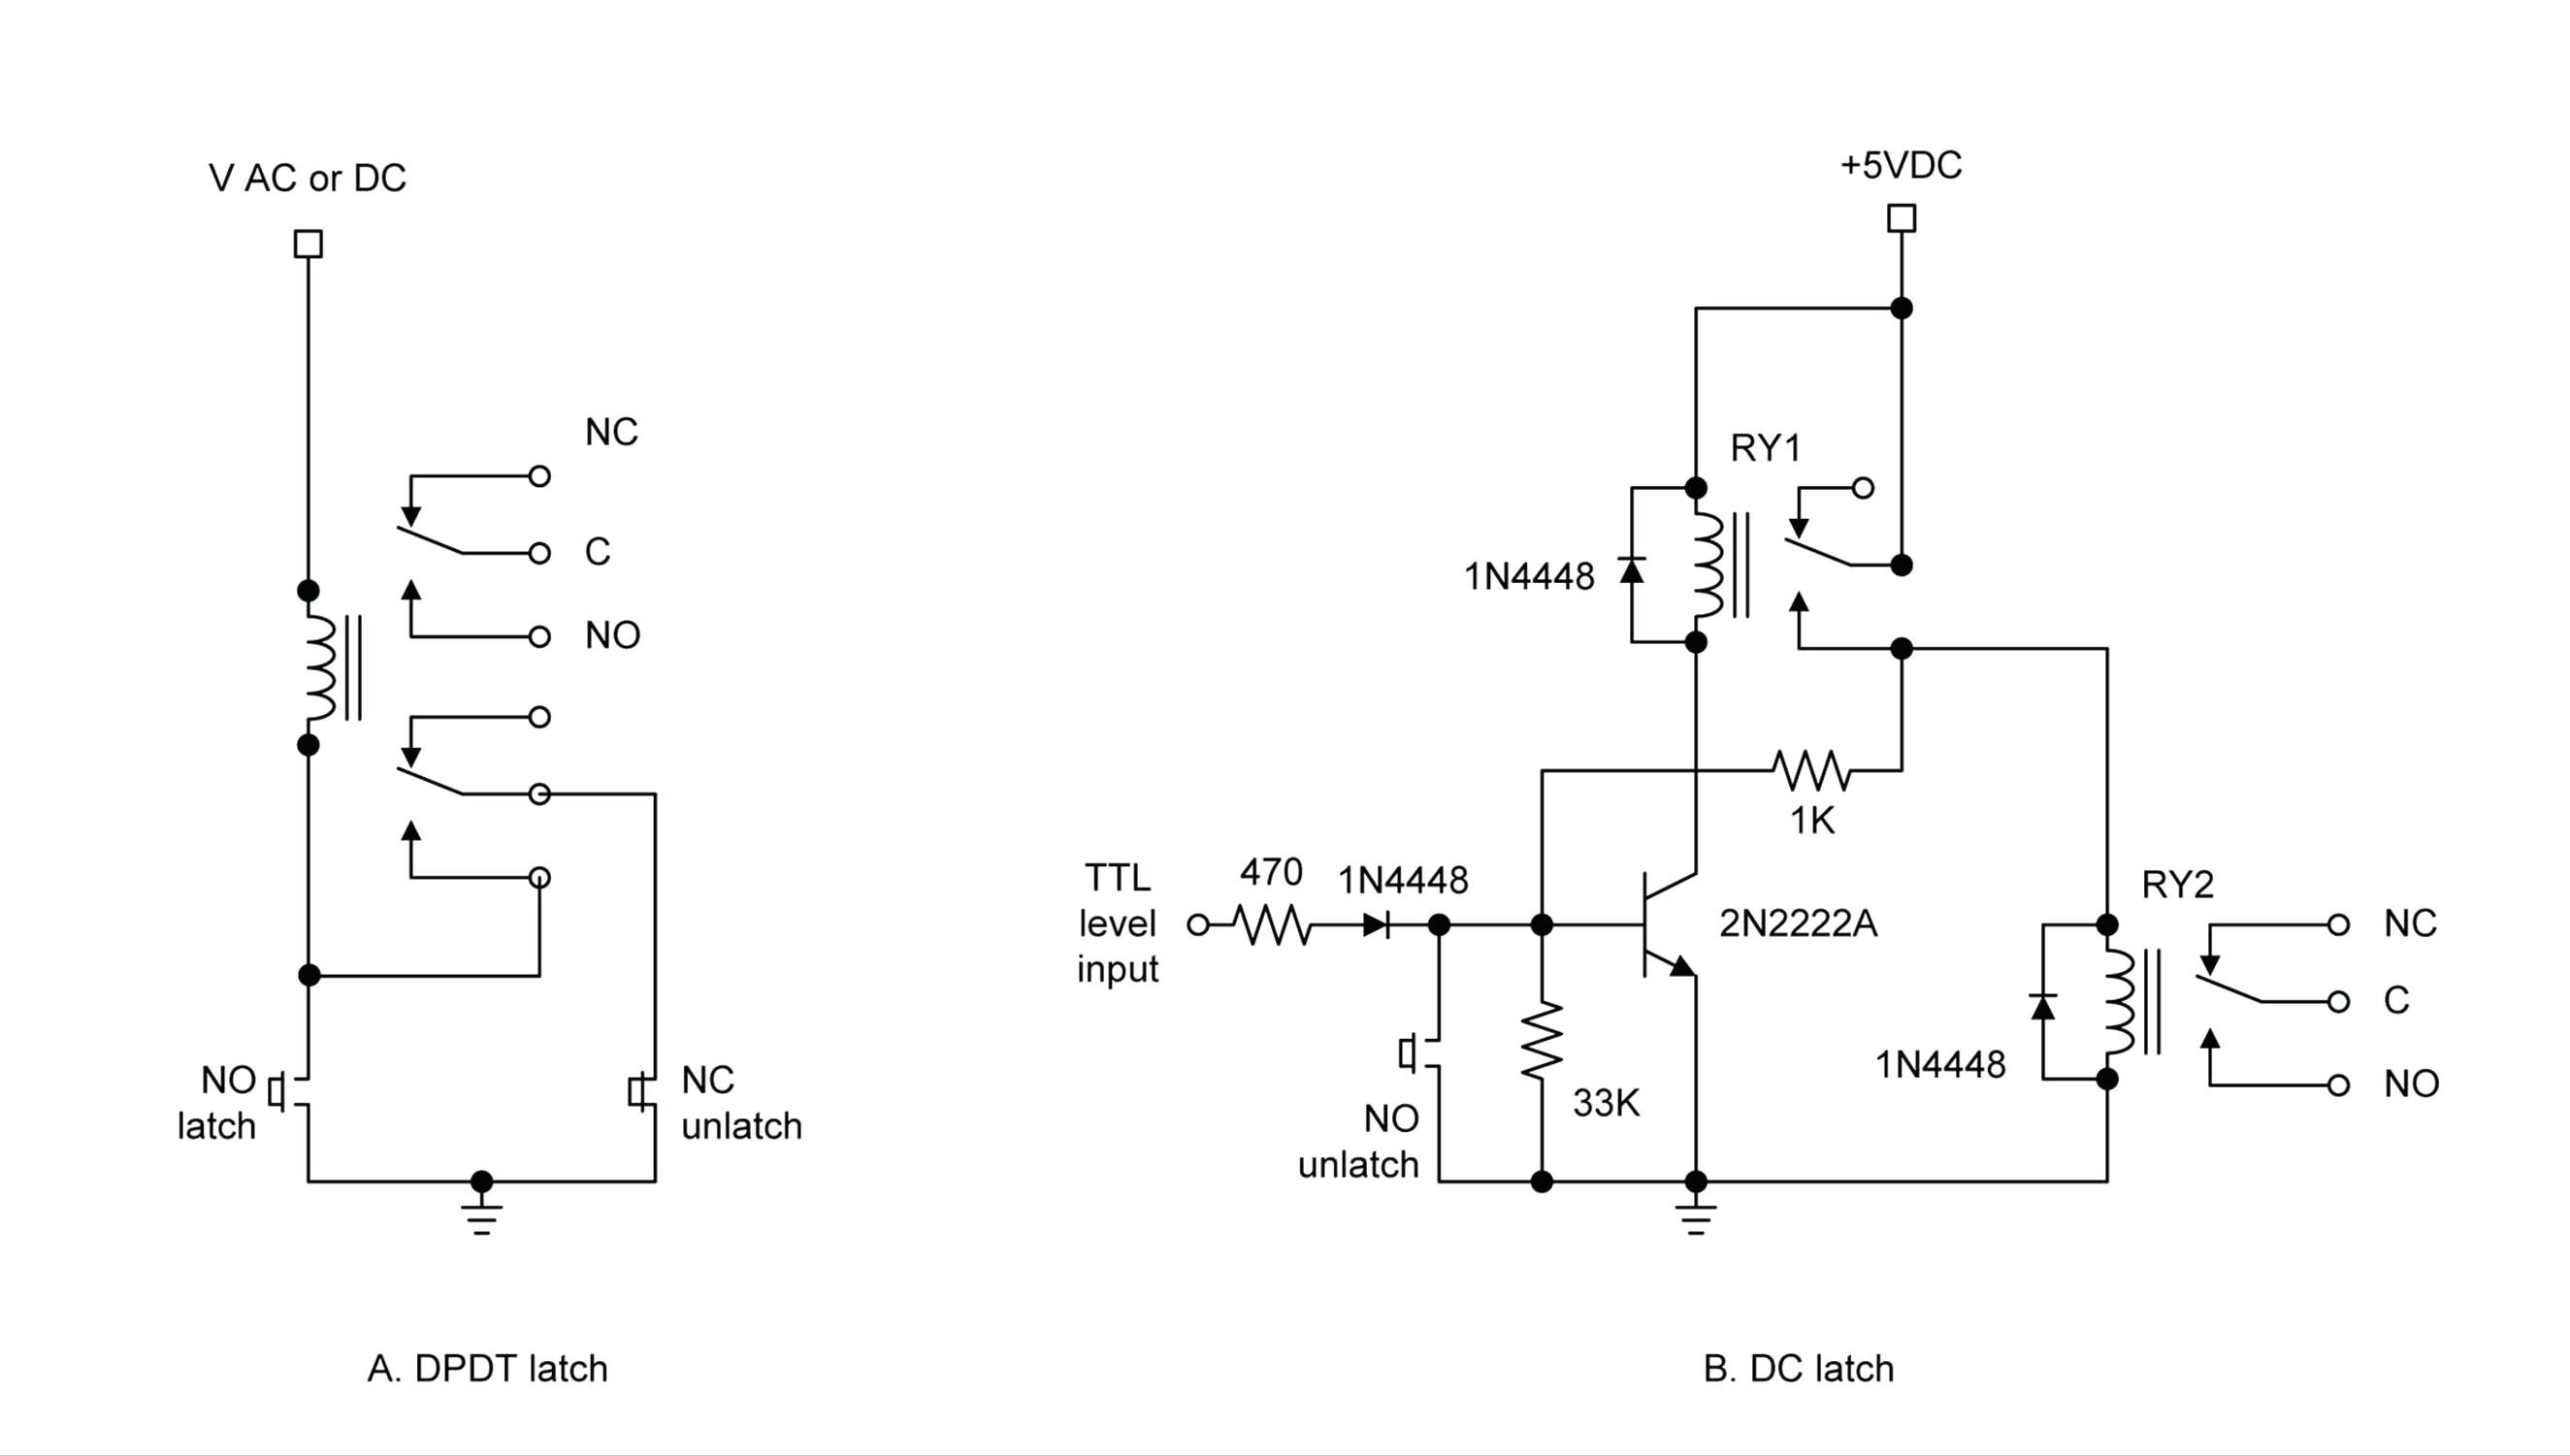 Car horn wiring diagram fresh horn wiring diagram with relay diagram car horn wiring diagram best car horn wiring diagram irelandnews of car horn wiring diagram fresh asfbconference2016 Gallery